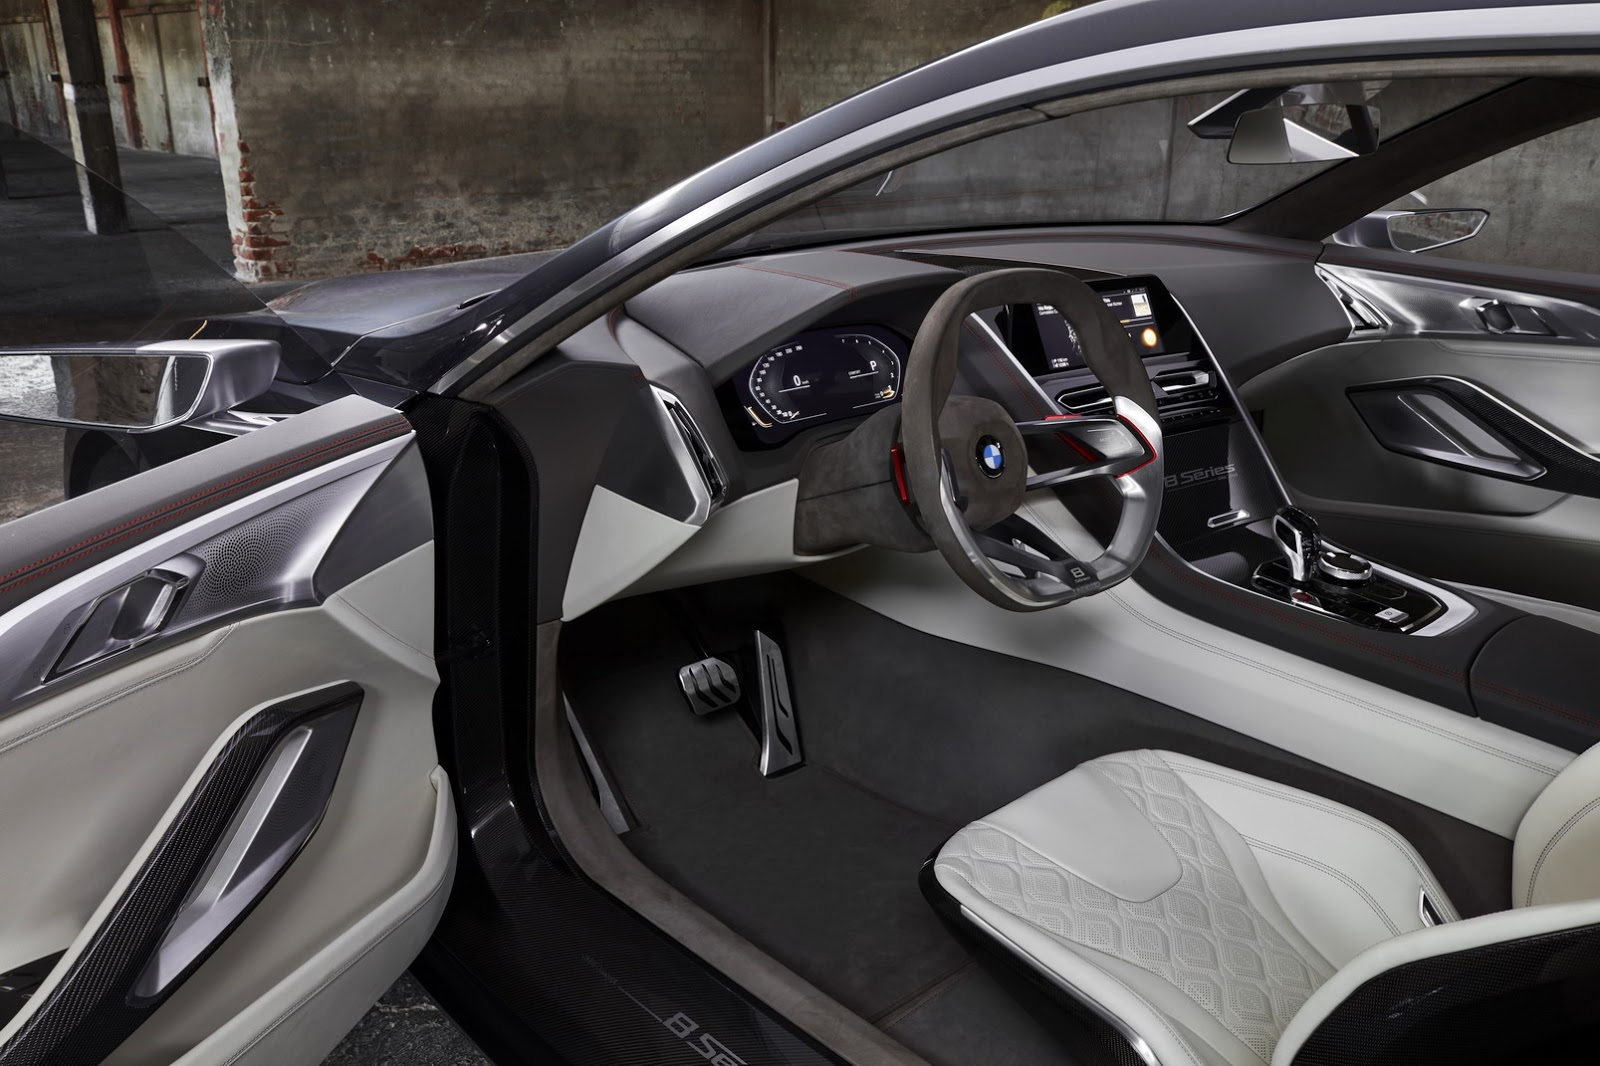 BMW_Concept_8_Series_47